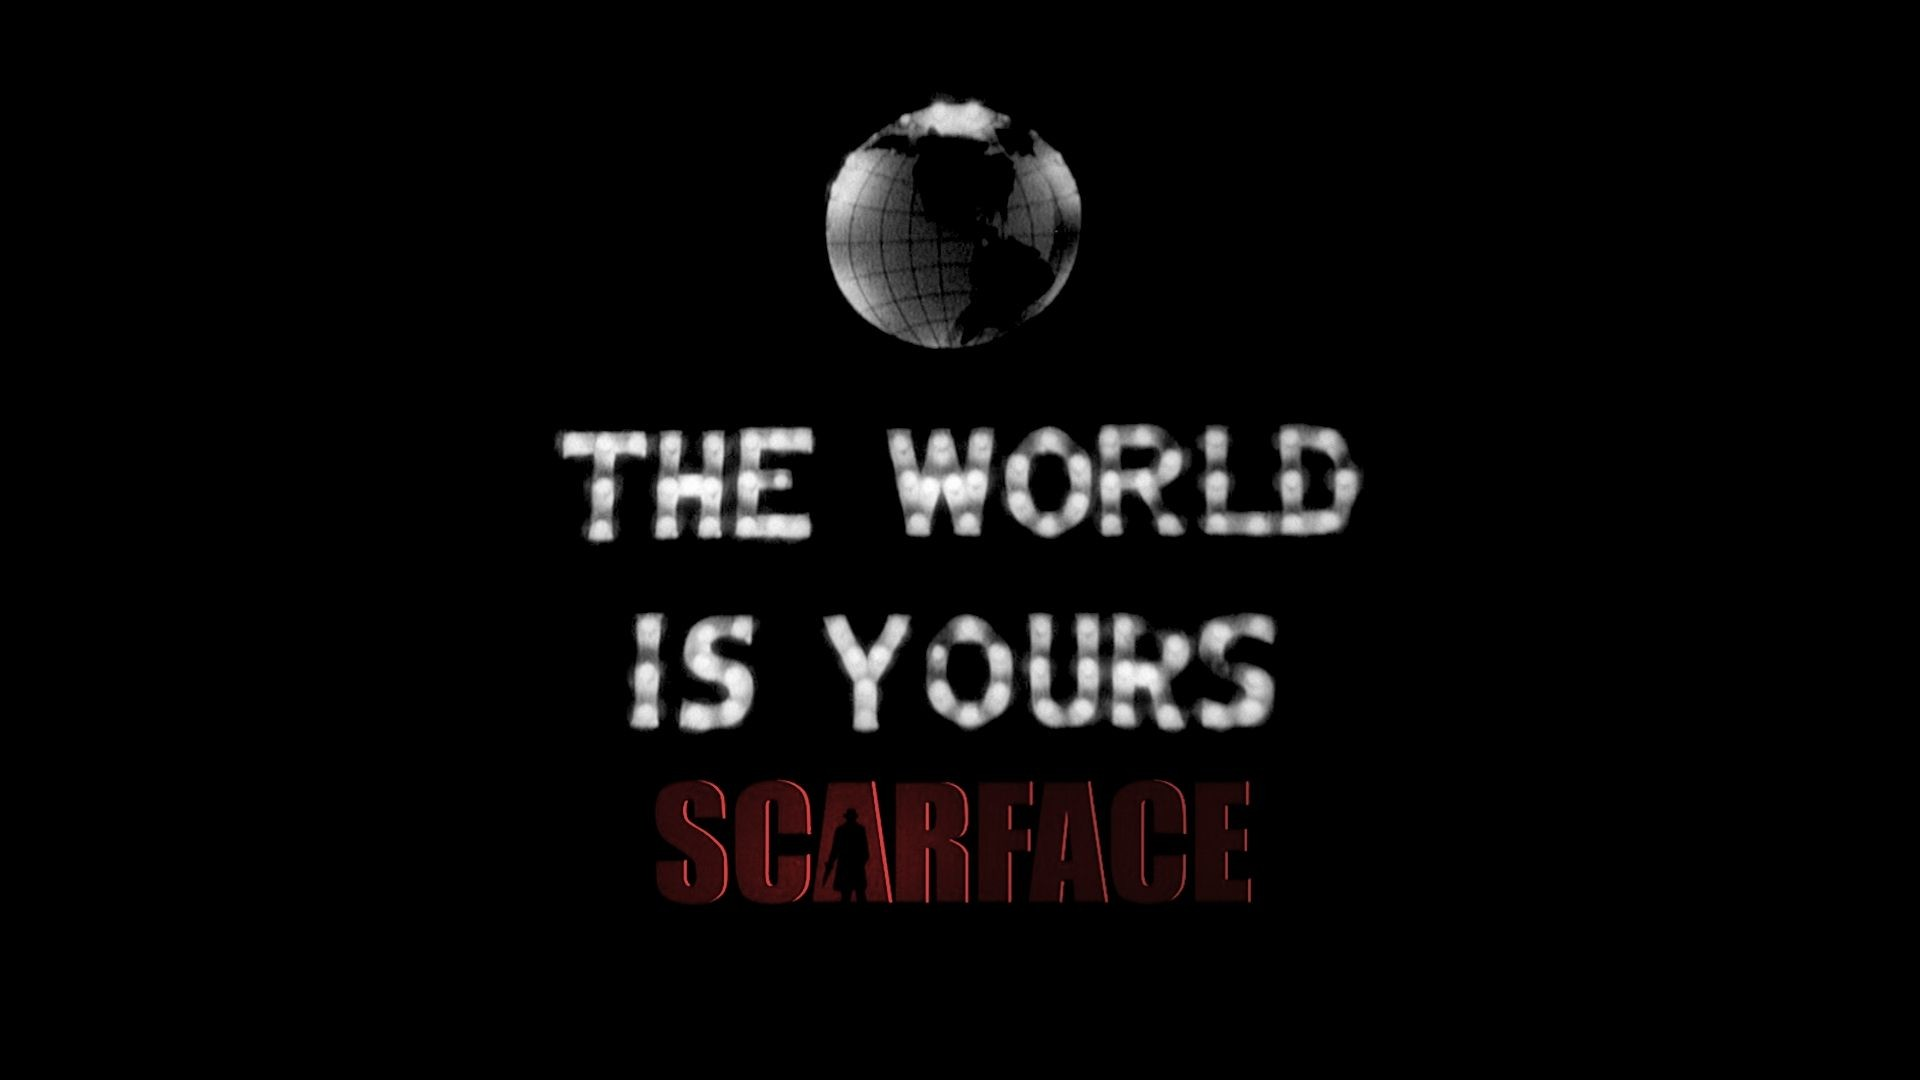 Scarface Wallpaper